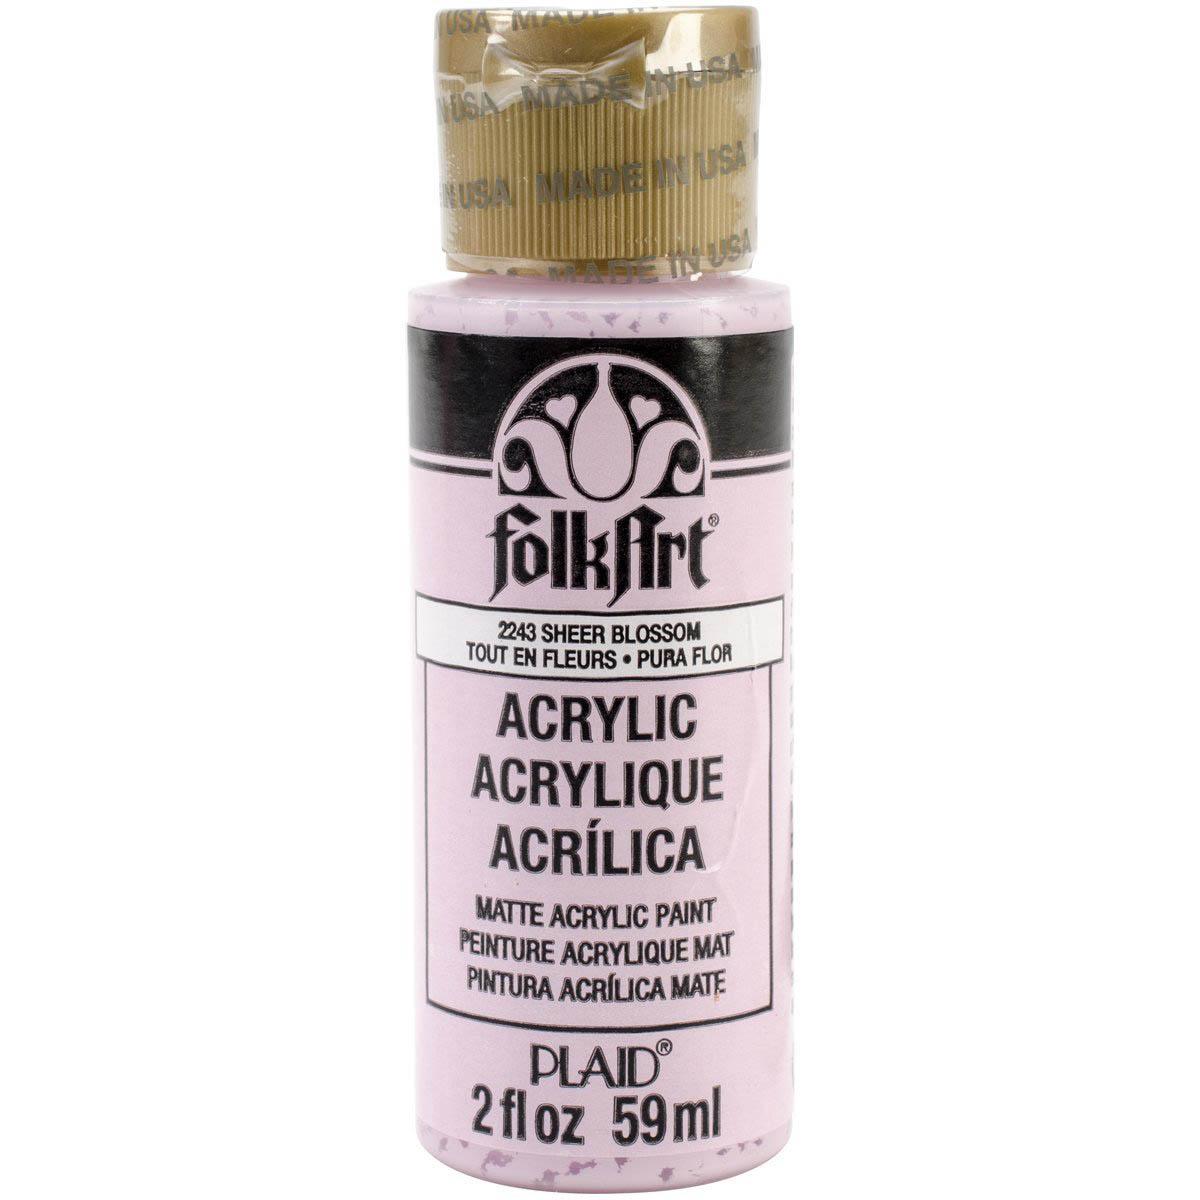 FolkArt ® Acrylic Colors - Sheer Blossom, 2 oz.